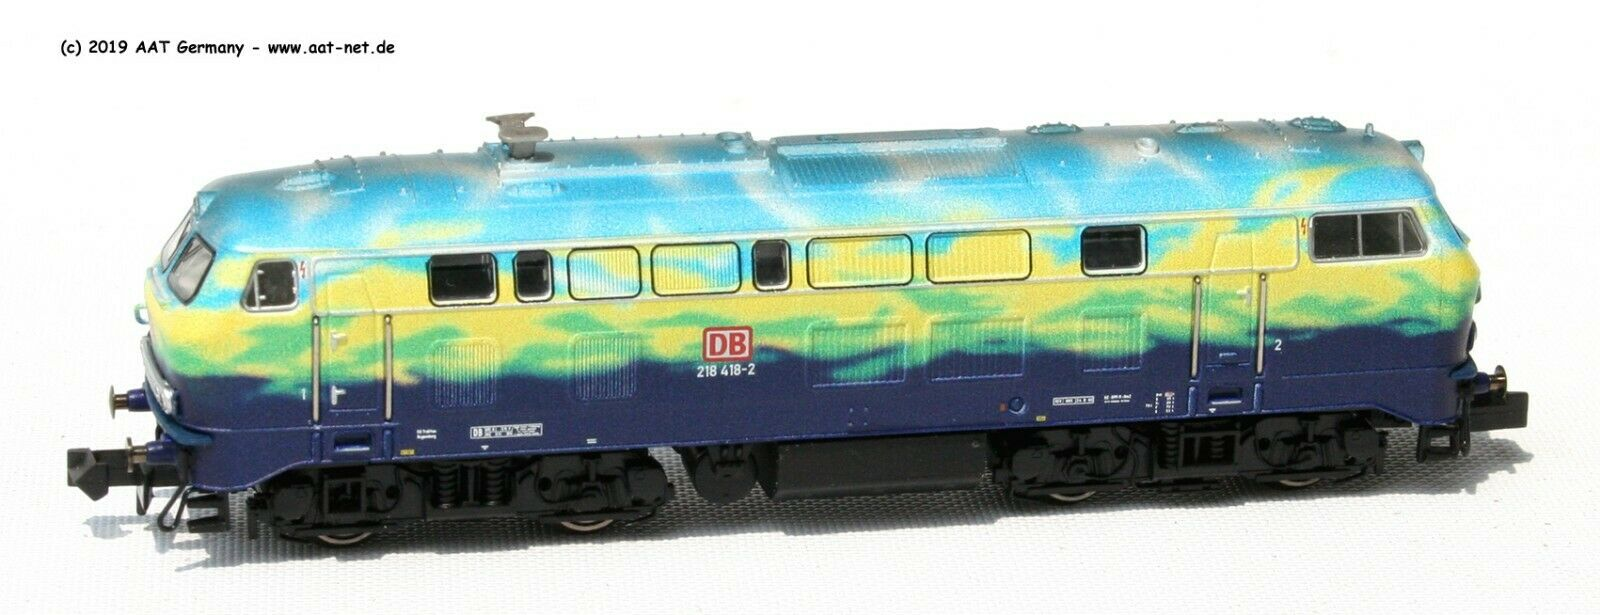 Minitrix N 16285  Locomotore Diesel Br 218 418 DB Ag Ep. V  Digitale nuovo e